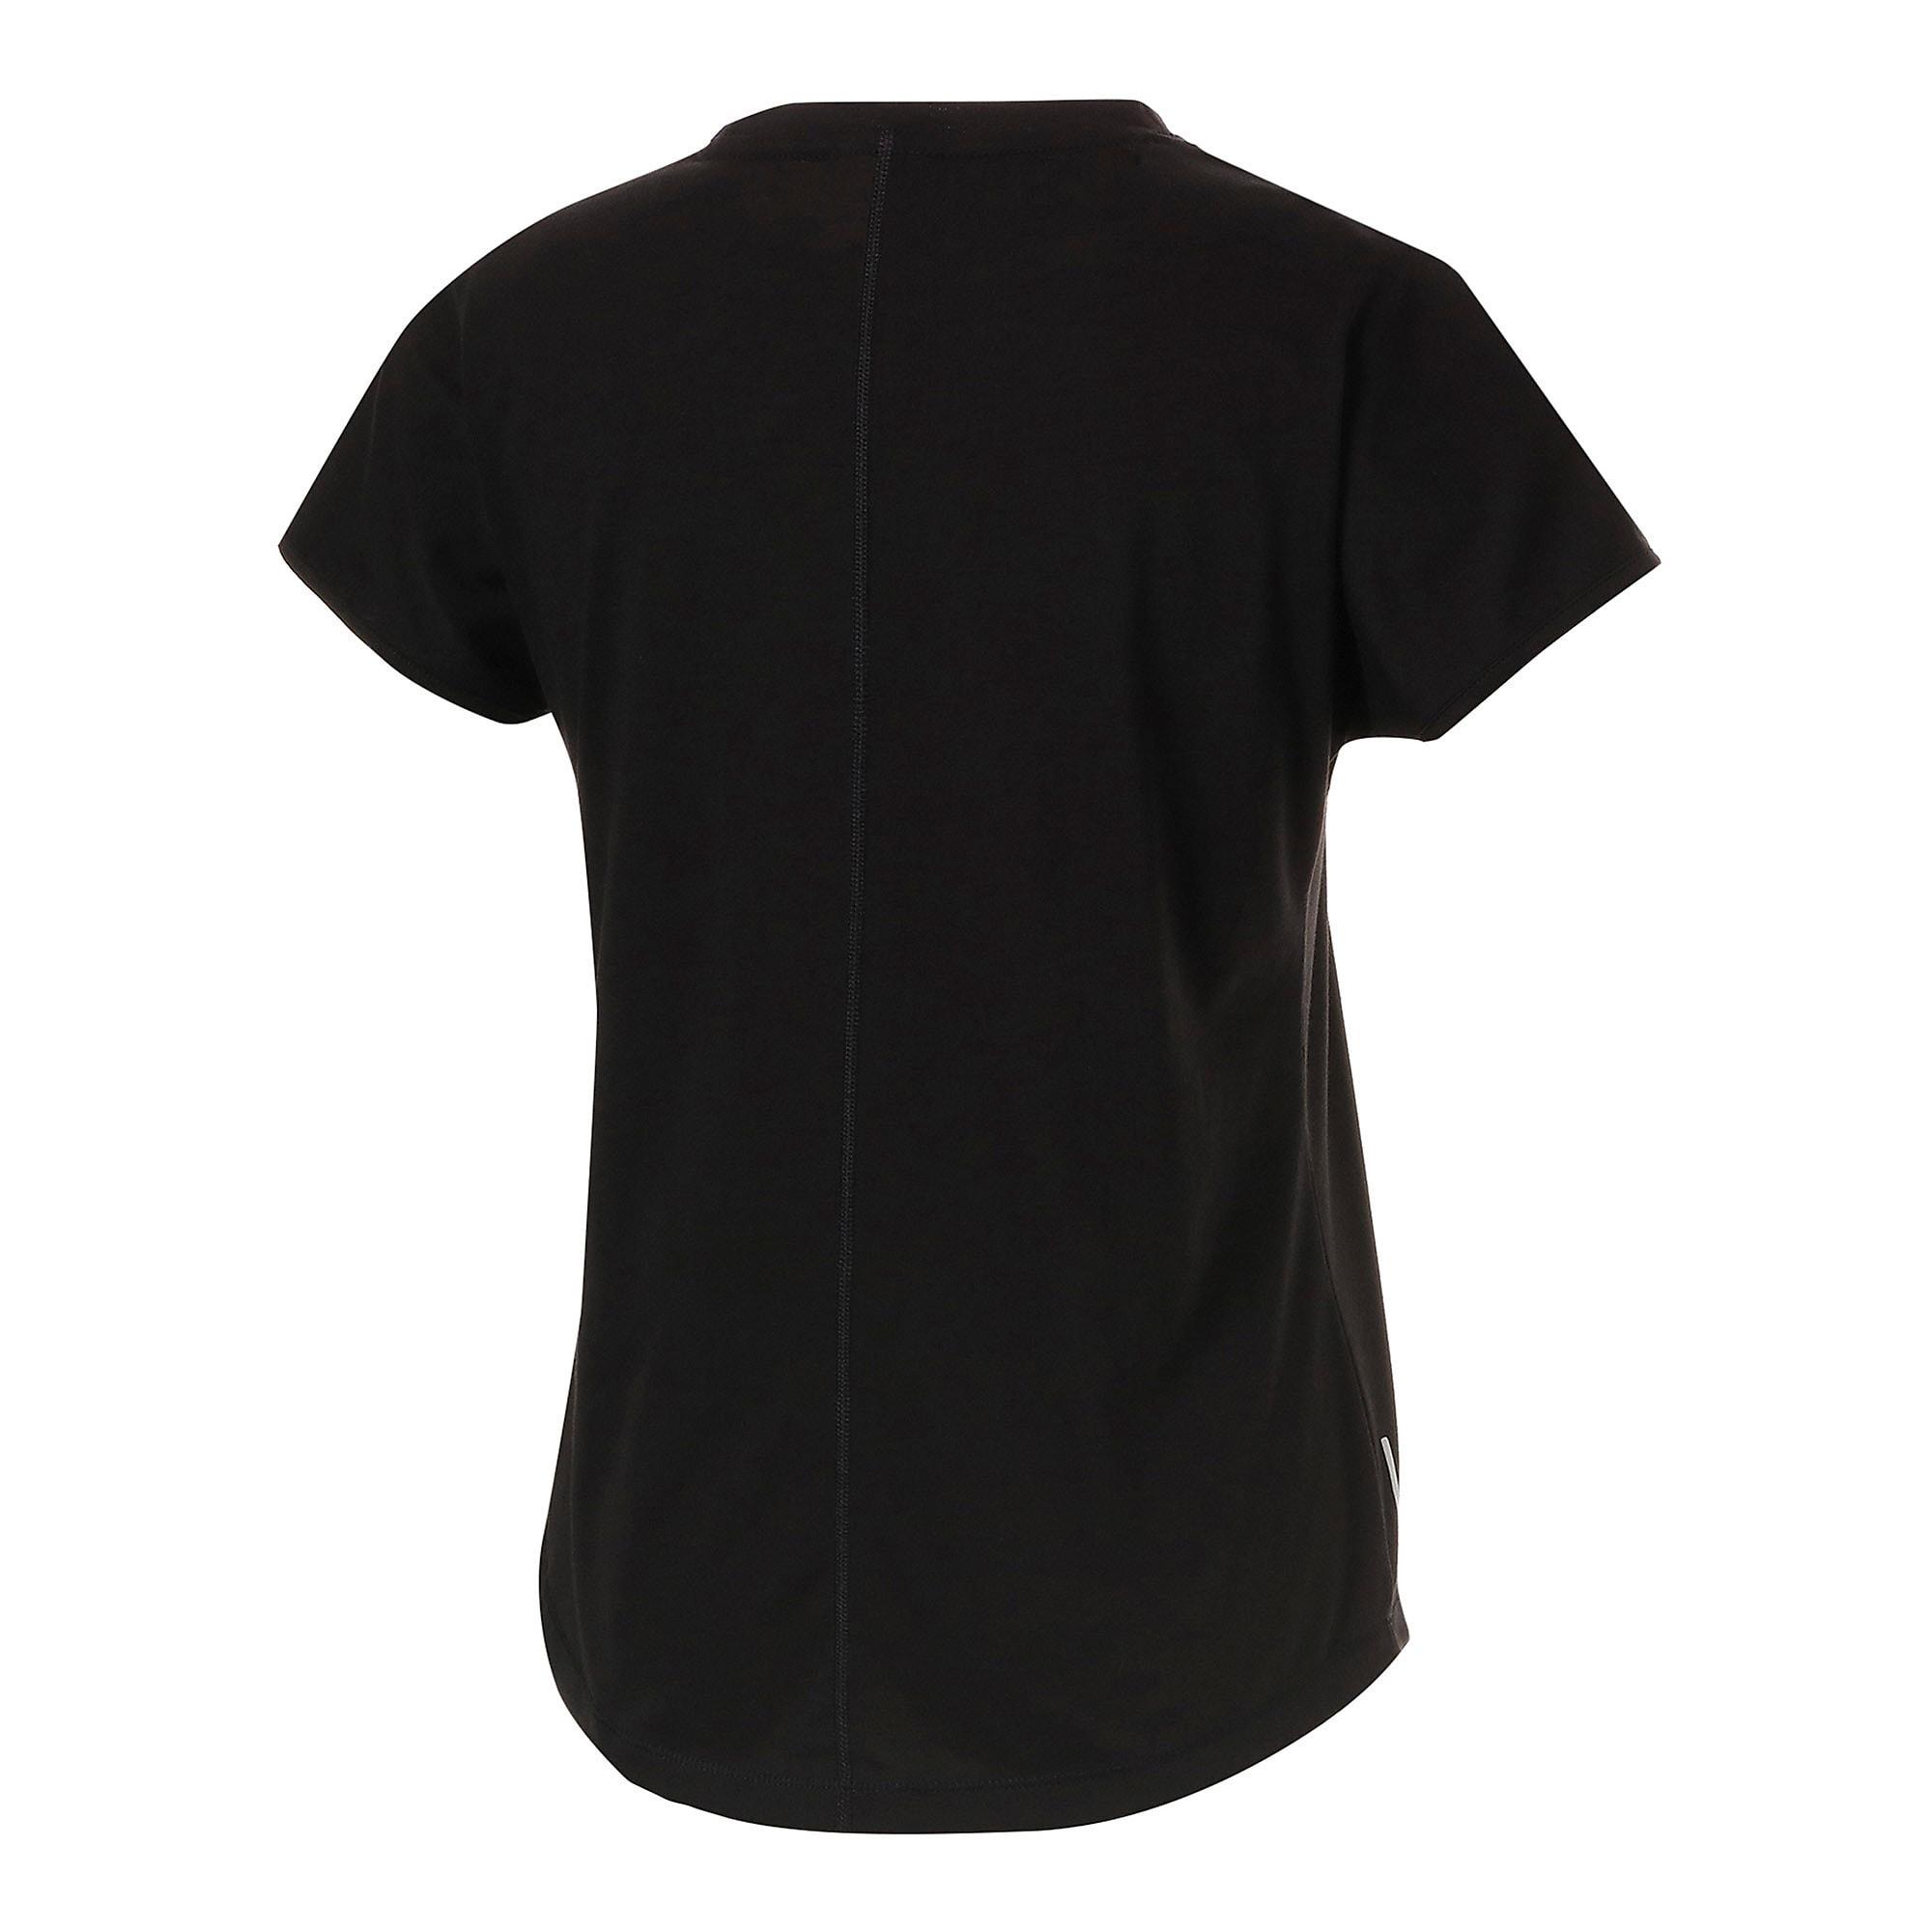 Thumbnail 6 of FAVORITE キャット SS ウィメンズ トレーニング Tシャツ 半袖, Puma Black-CAT Q3, medium-JPN